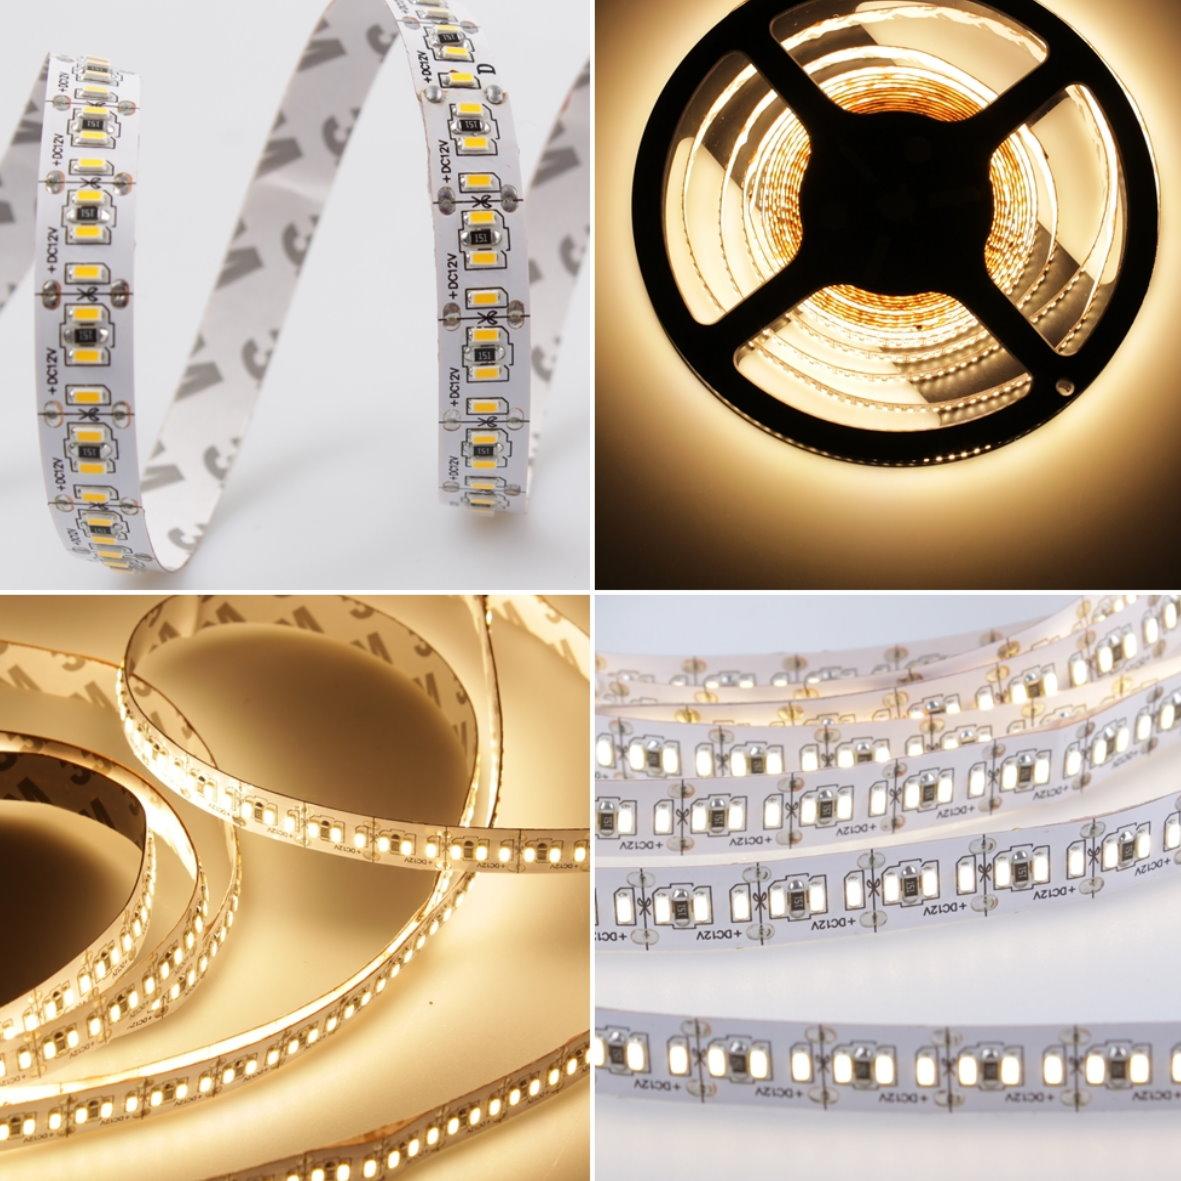 9 98 eur m led lichtband 5m dimmbar 90w 12000lm. Black Bedroom Furniture Sets. Home Design Ideas